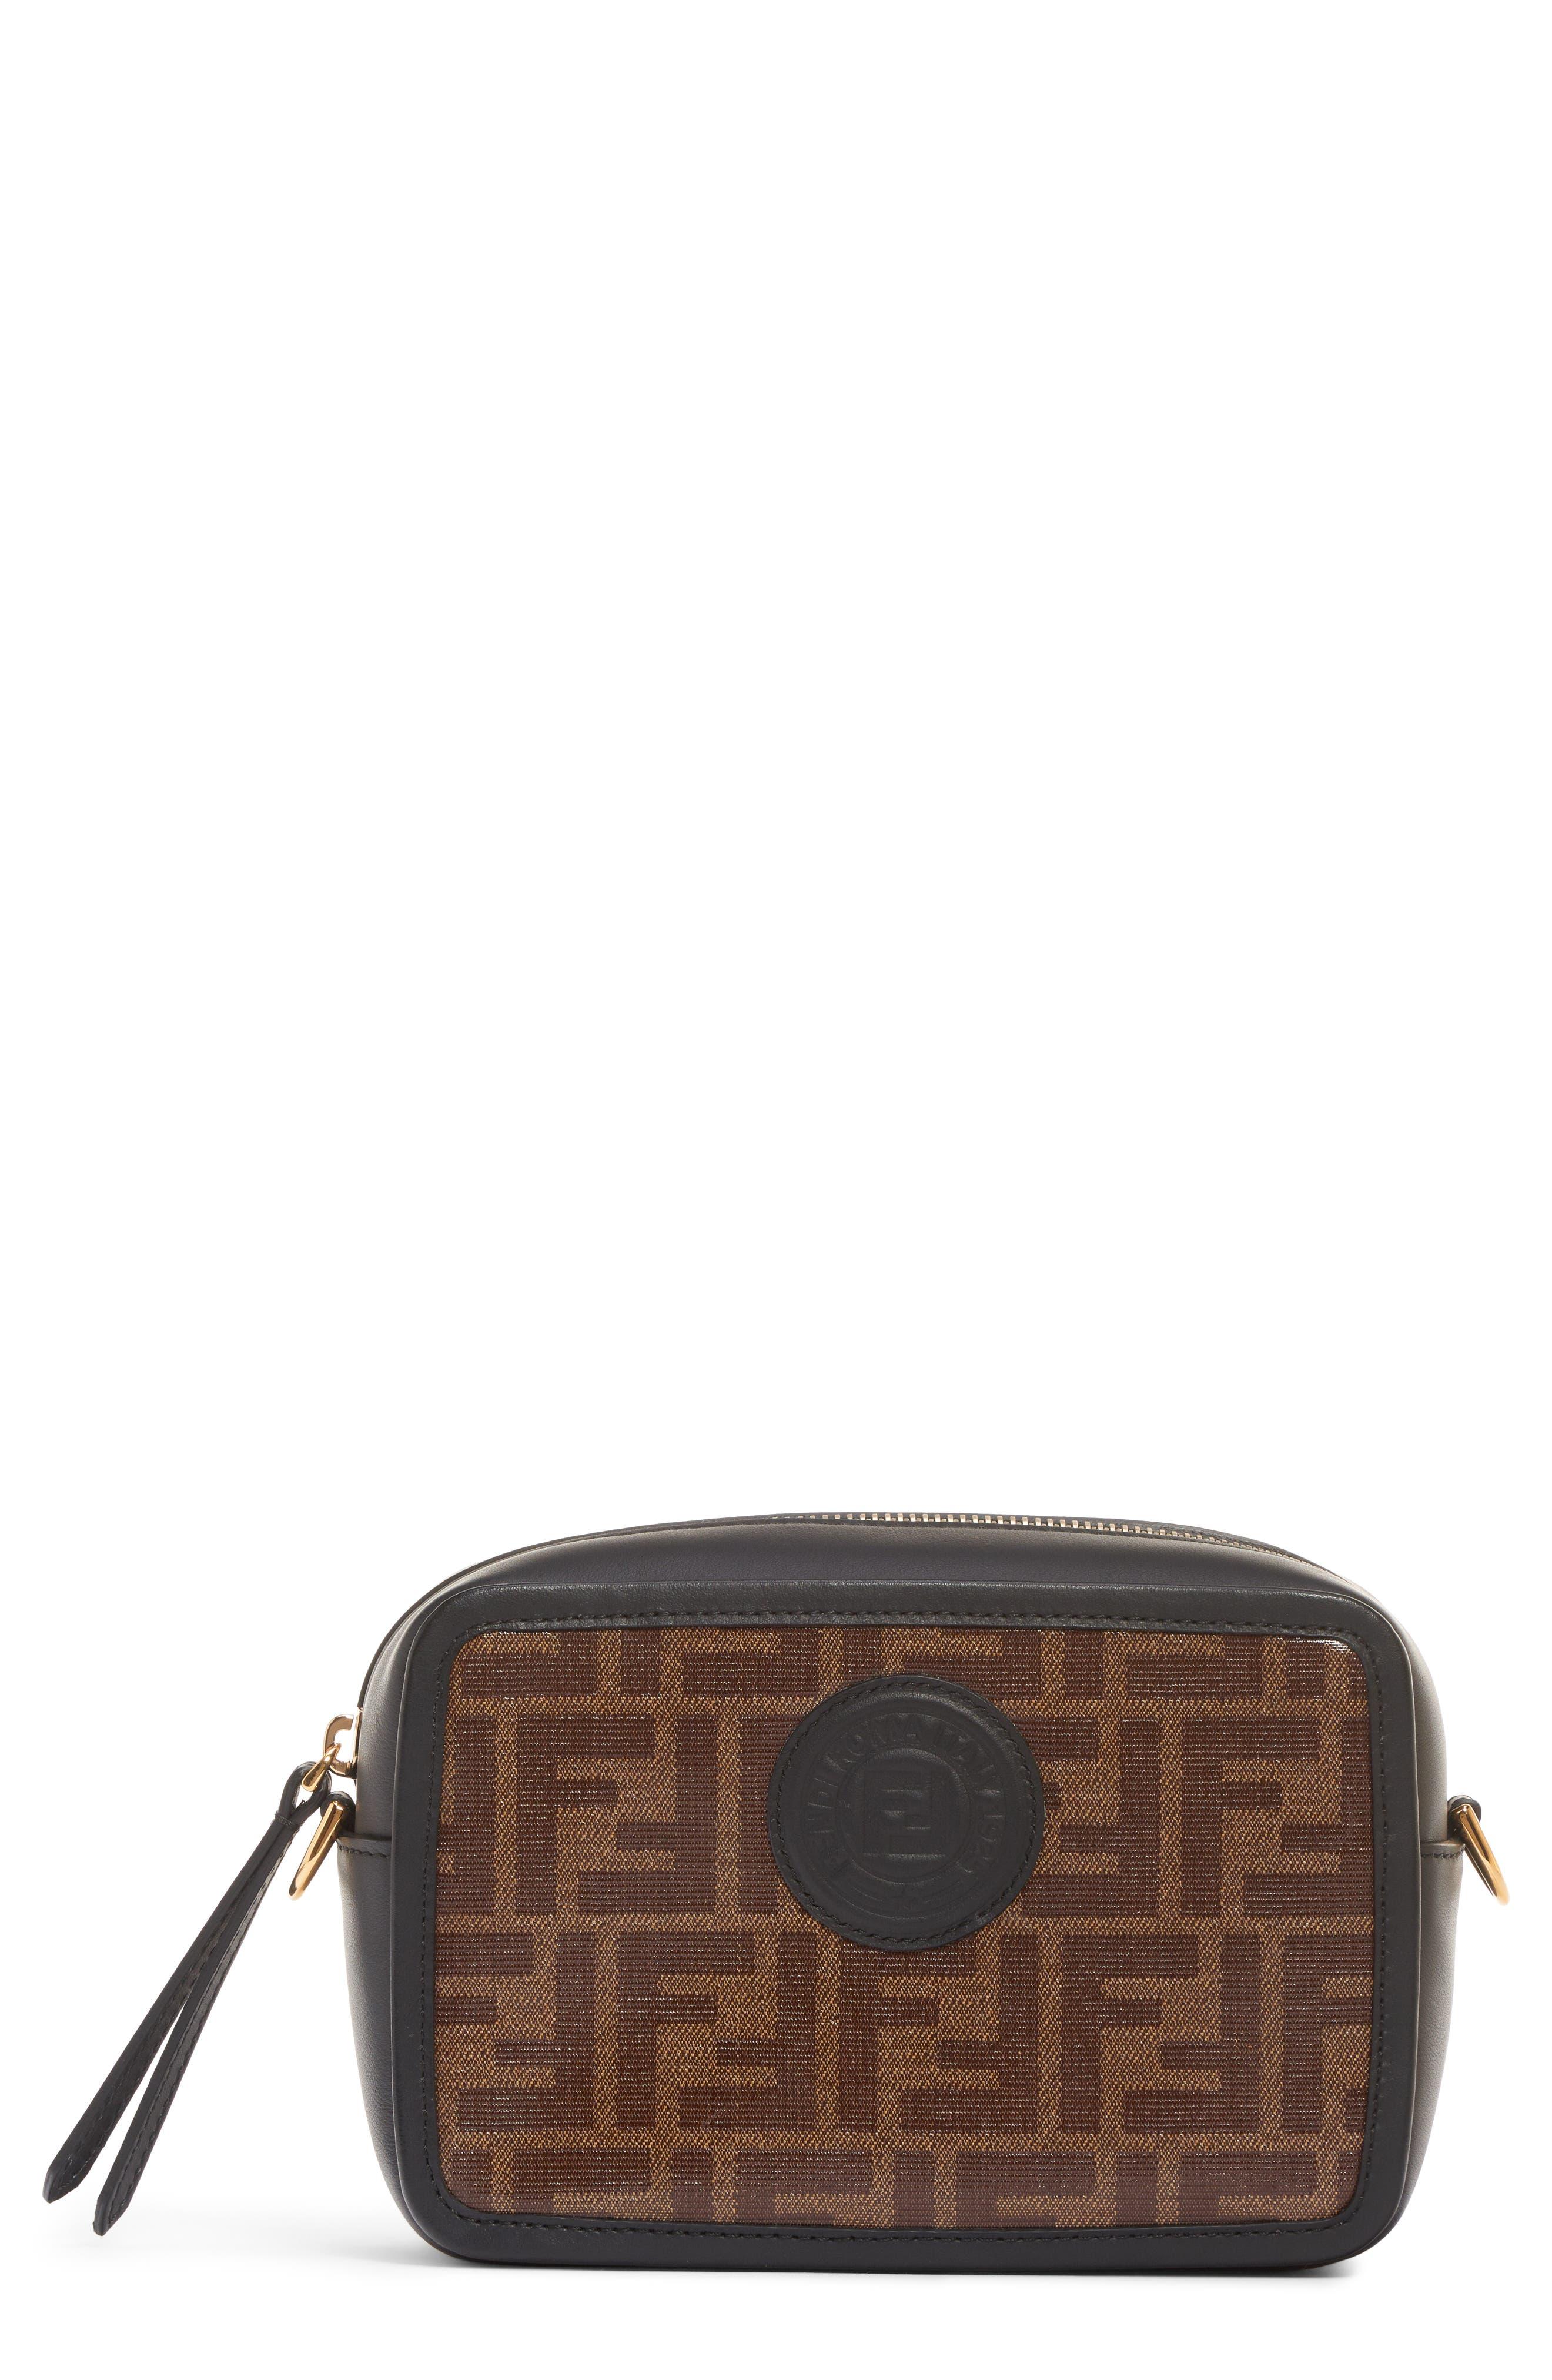 Logo Canvas Camera Bag,                         Main,                         color, MOHOGANY PANNA/ NERO/ ORO SOFT